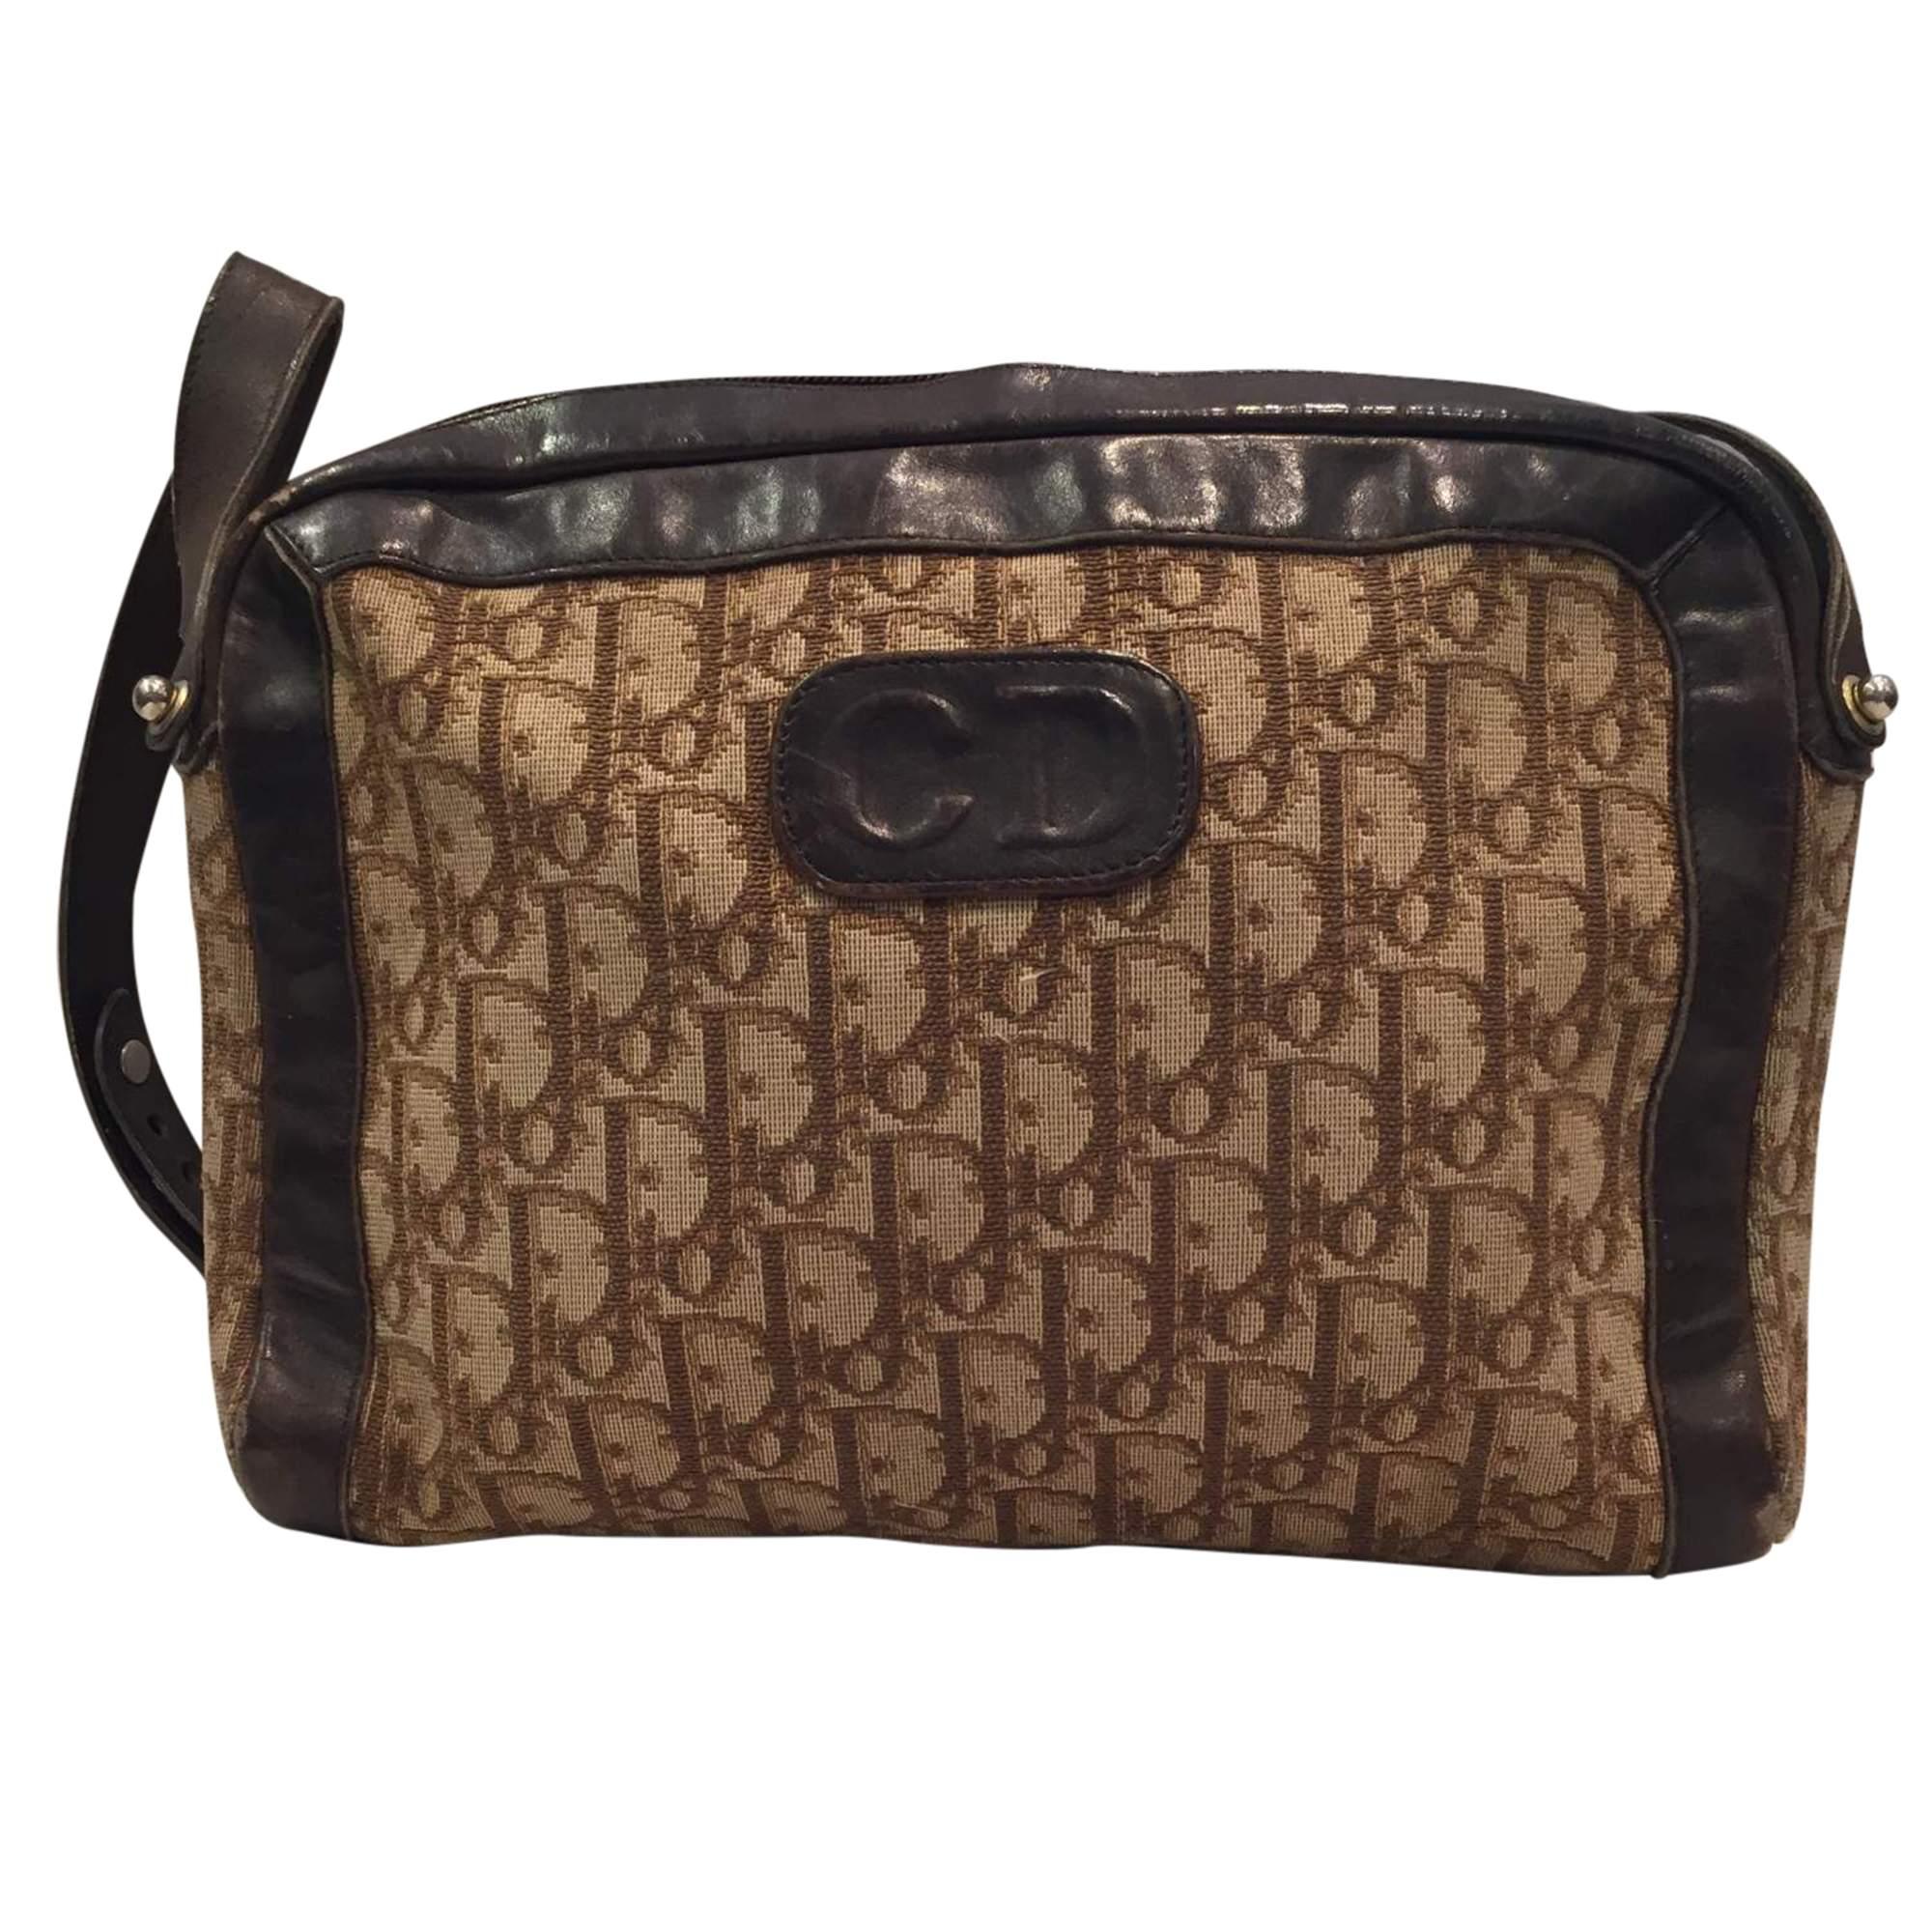 67a78f8b56 Gucci Vintage 1970 canvas monogram Bag